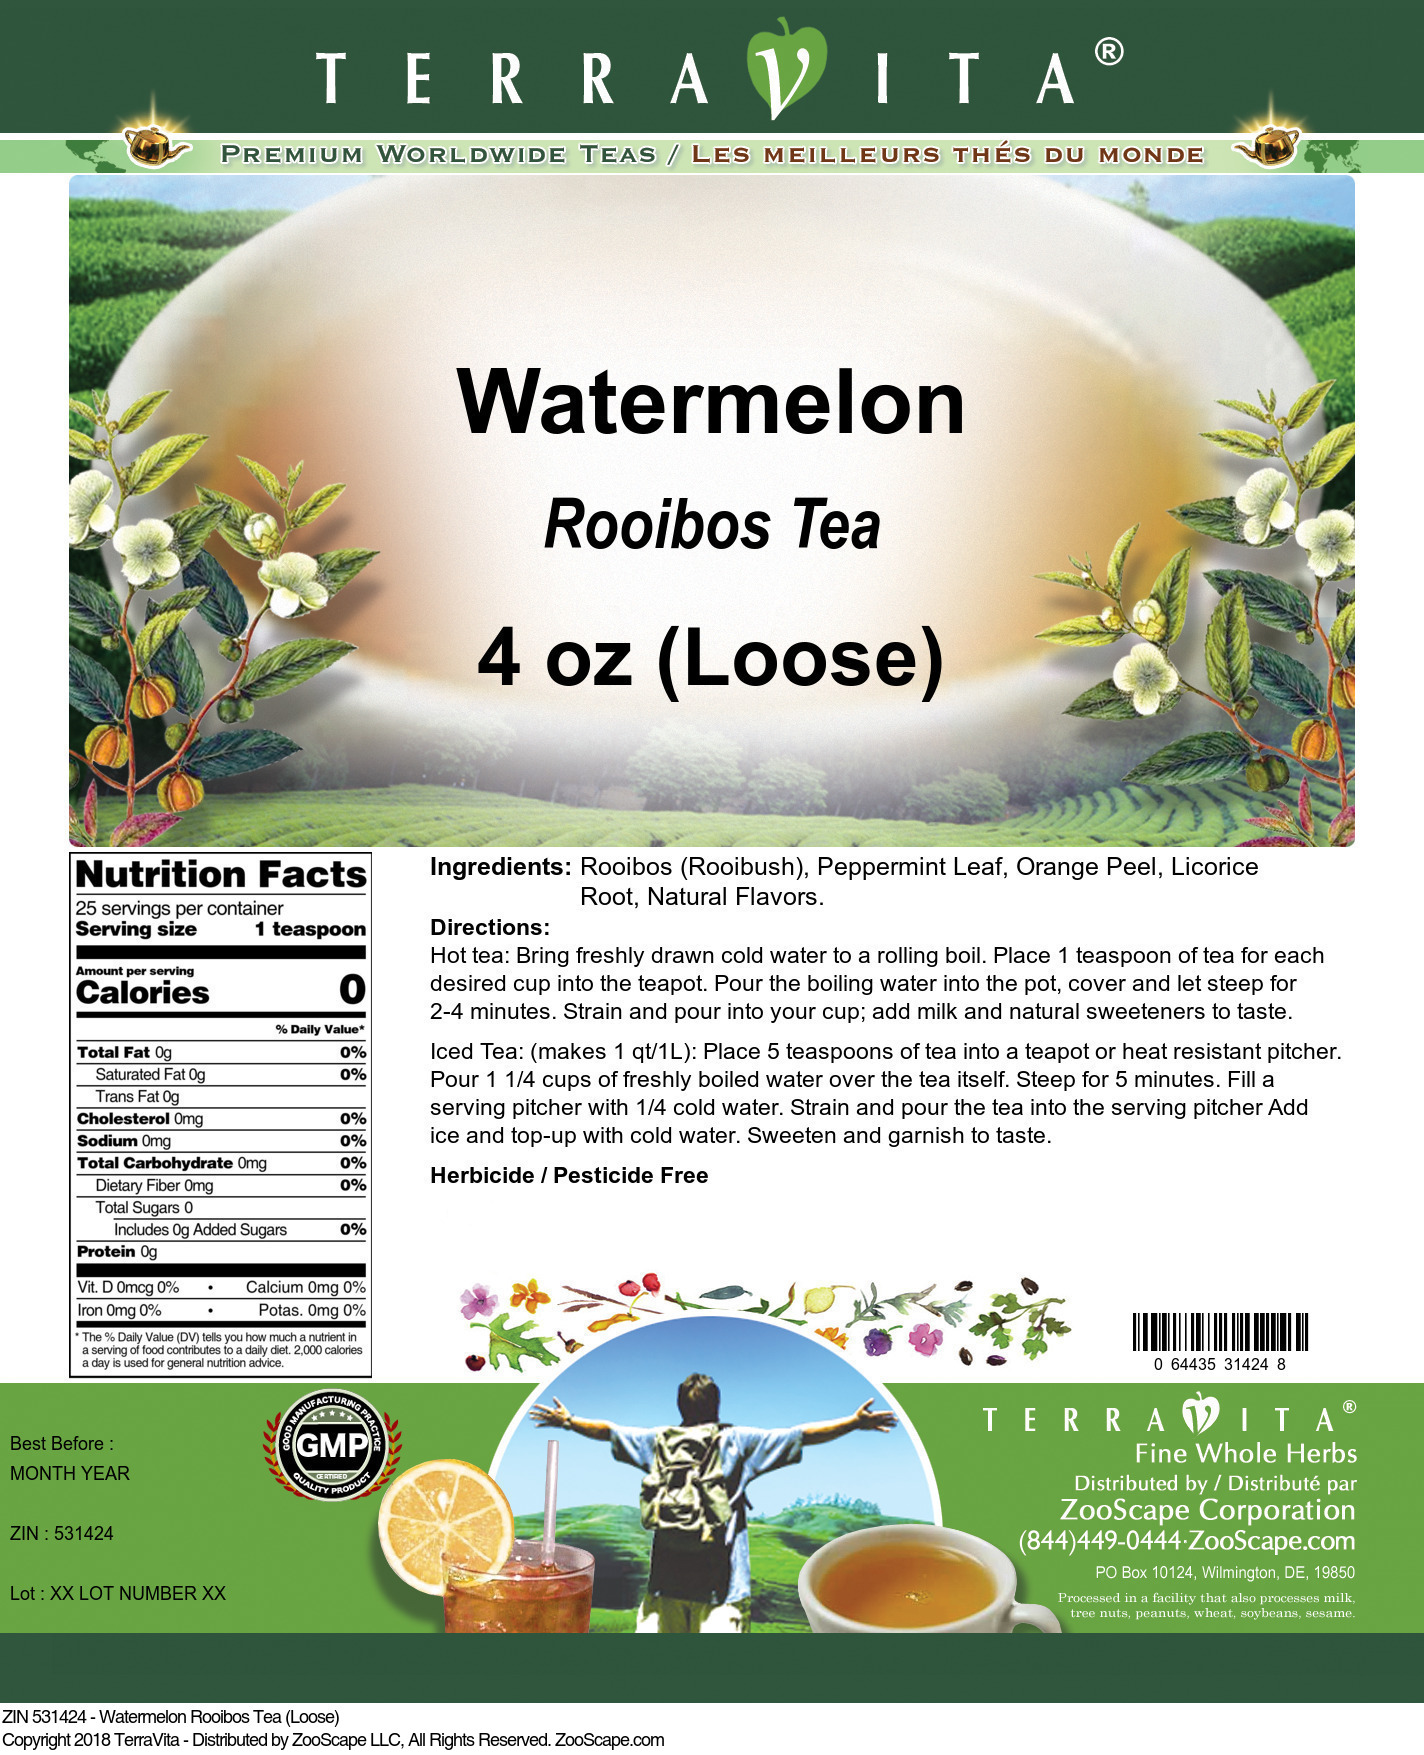 Watermelon Rooibos Tea (Loose)